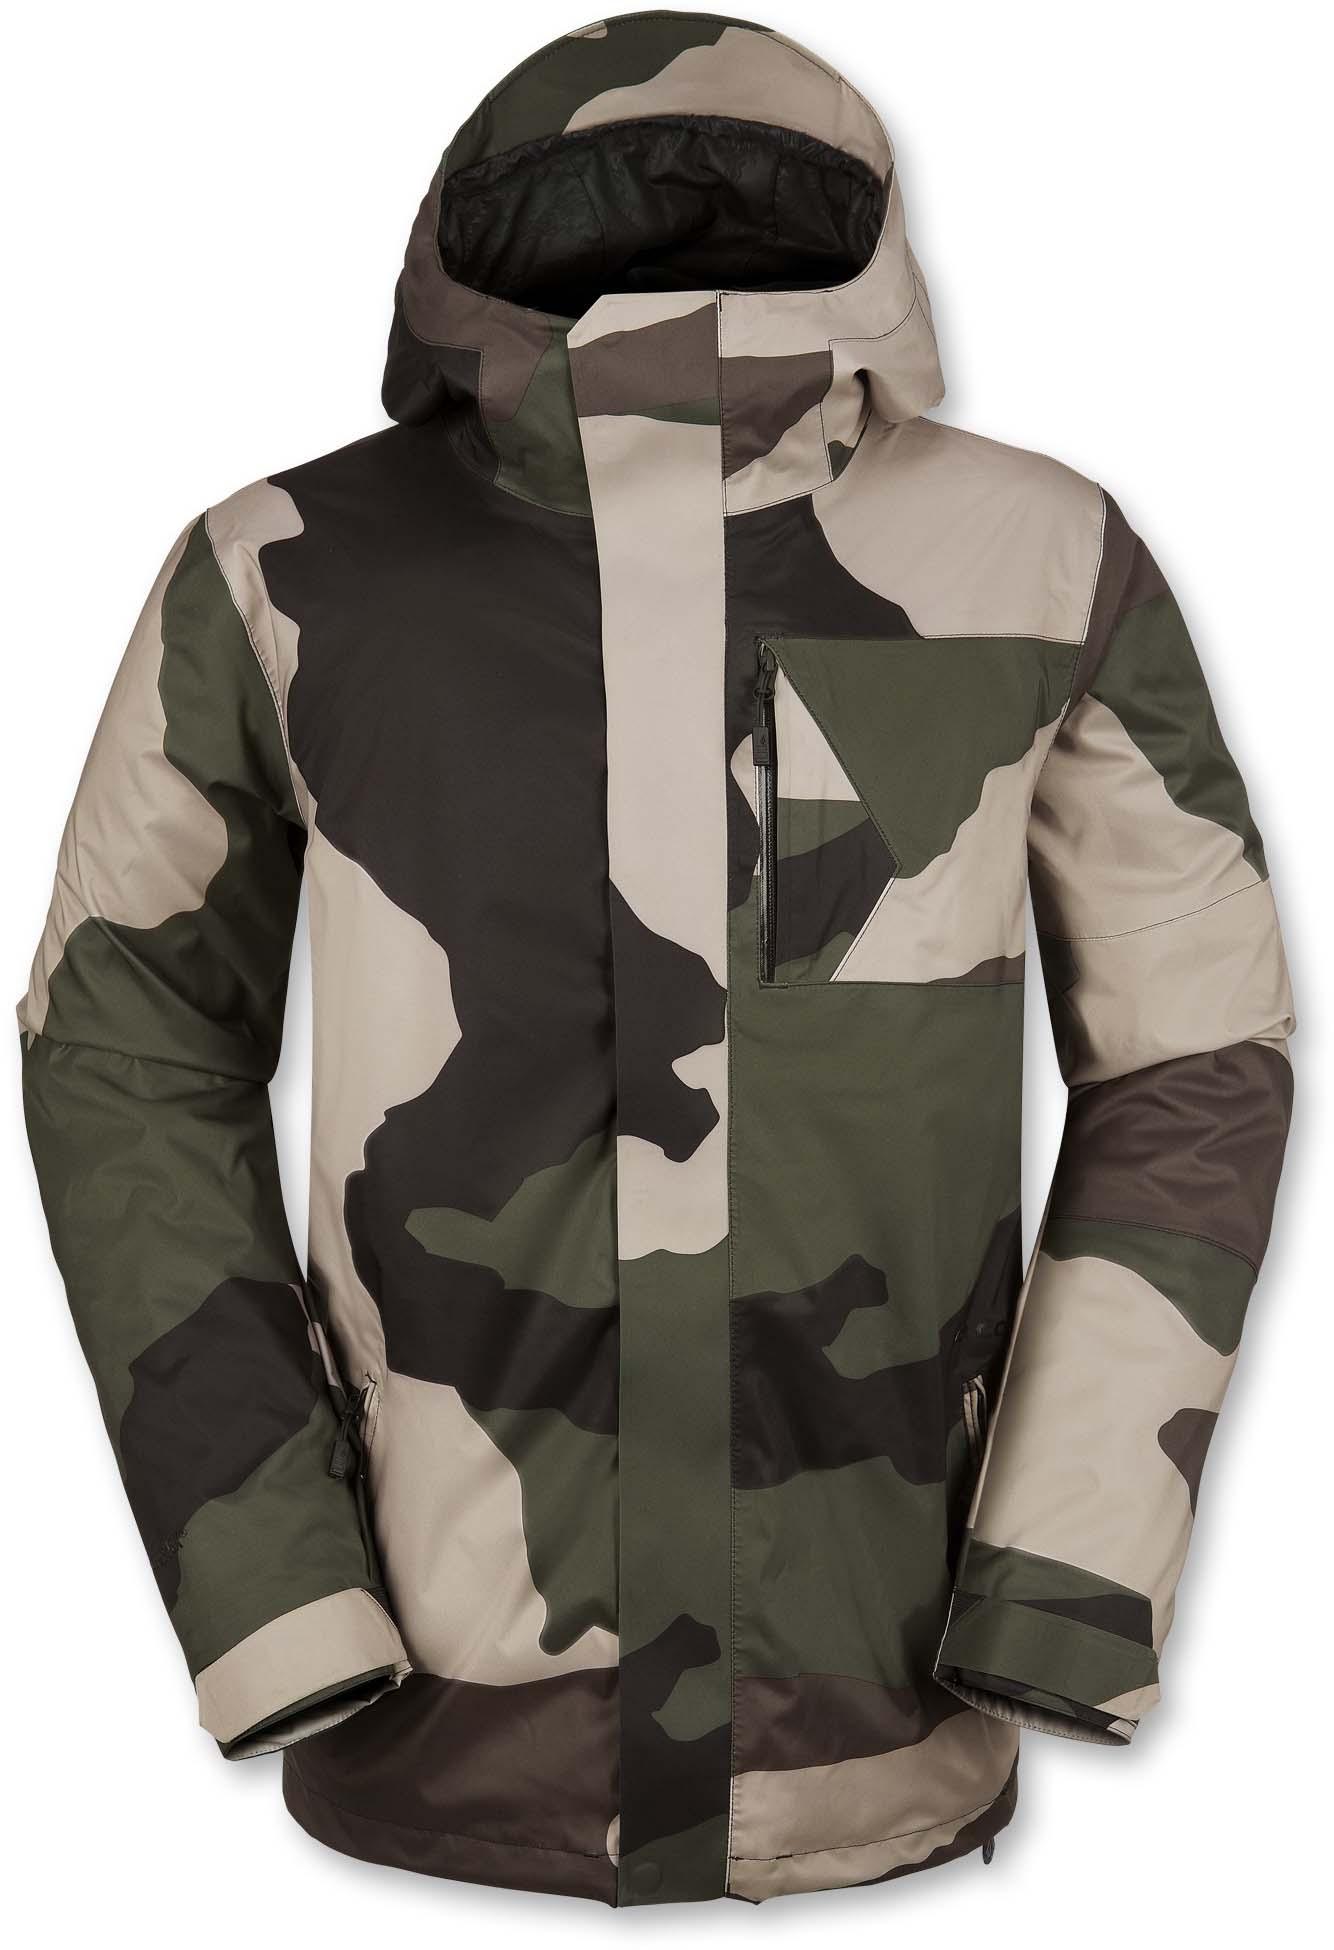 image volcom-l-gore-tex-jacket-camo-jpg